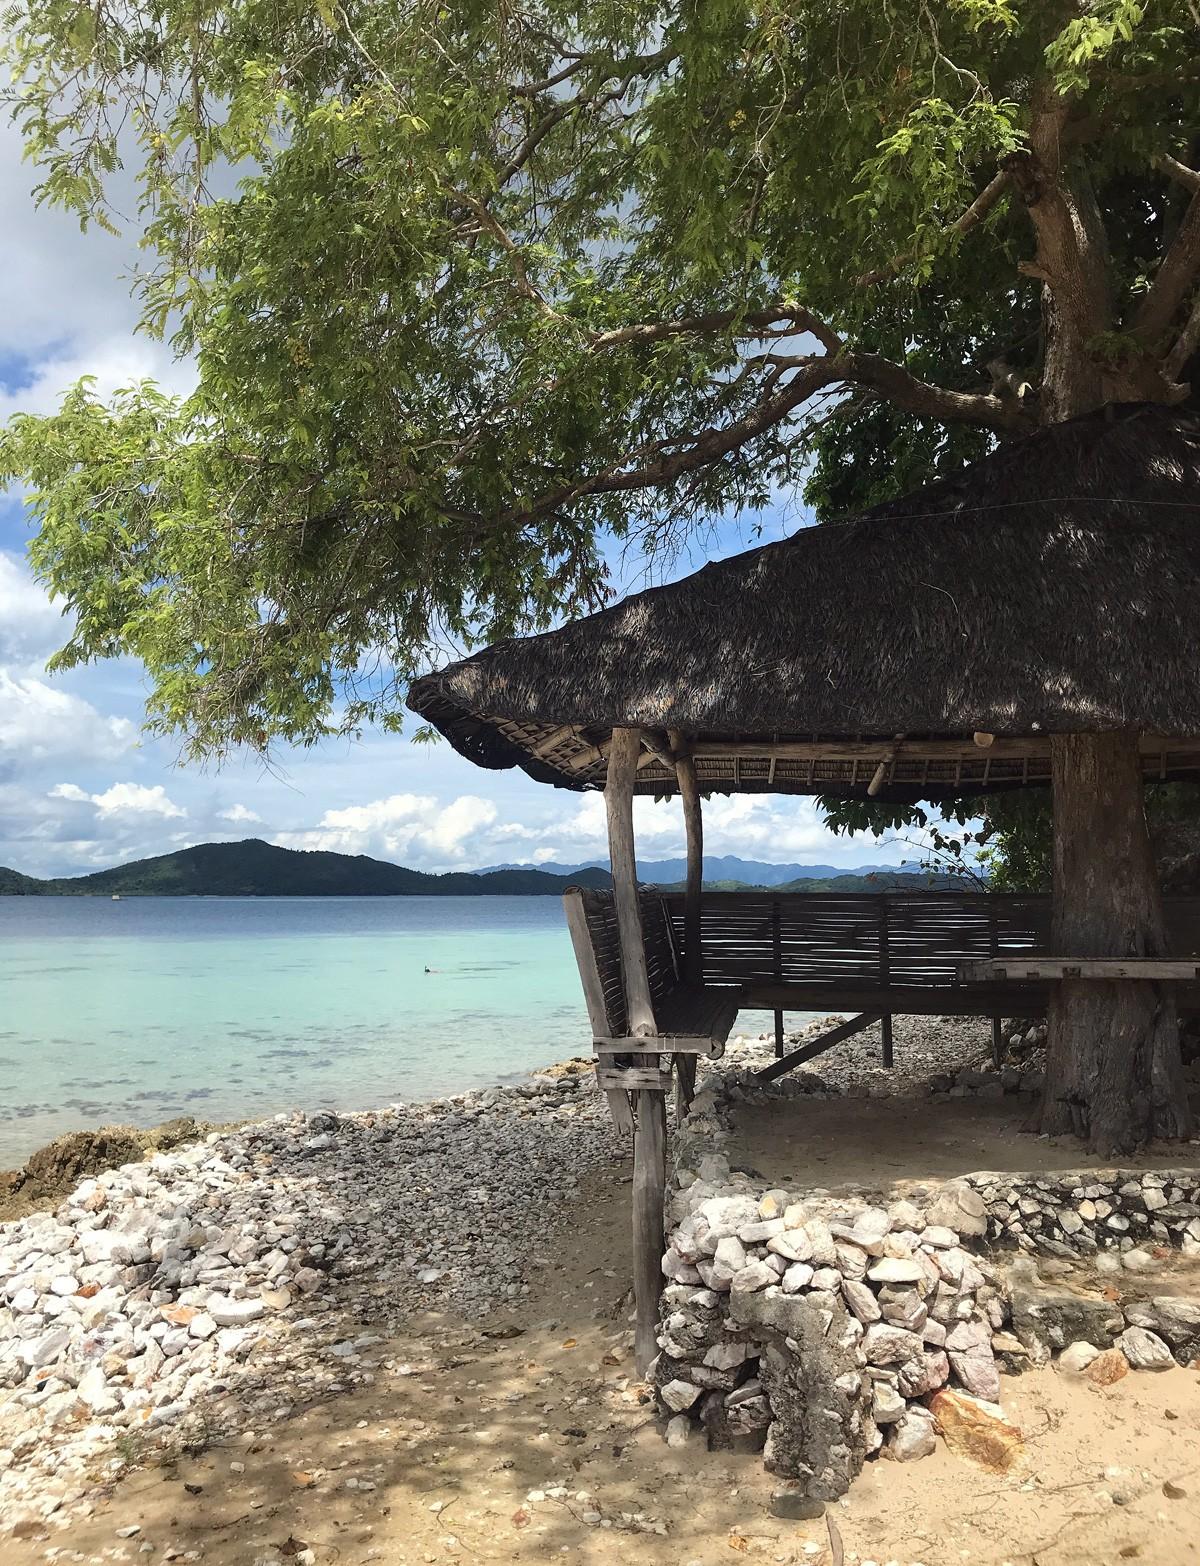 Cheron island photo